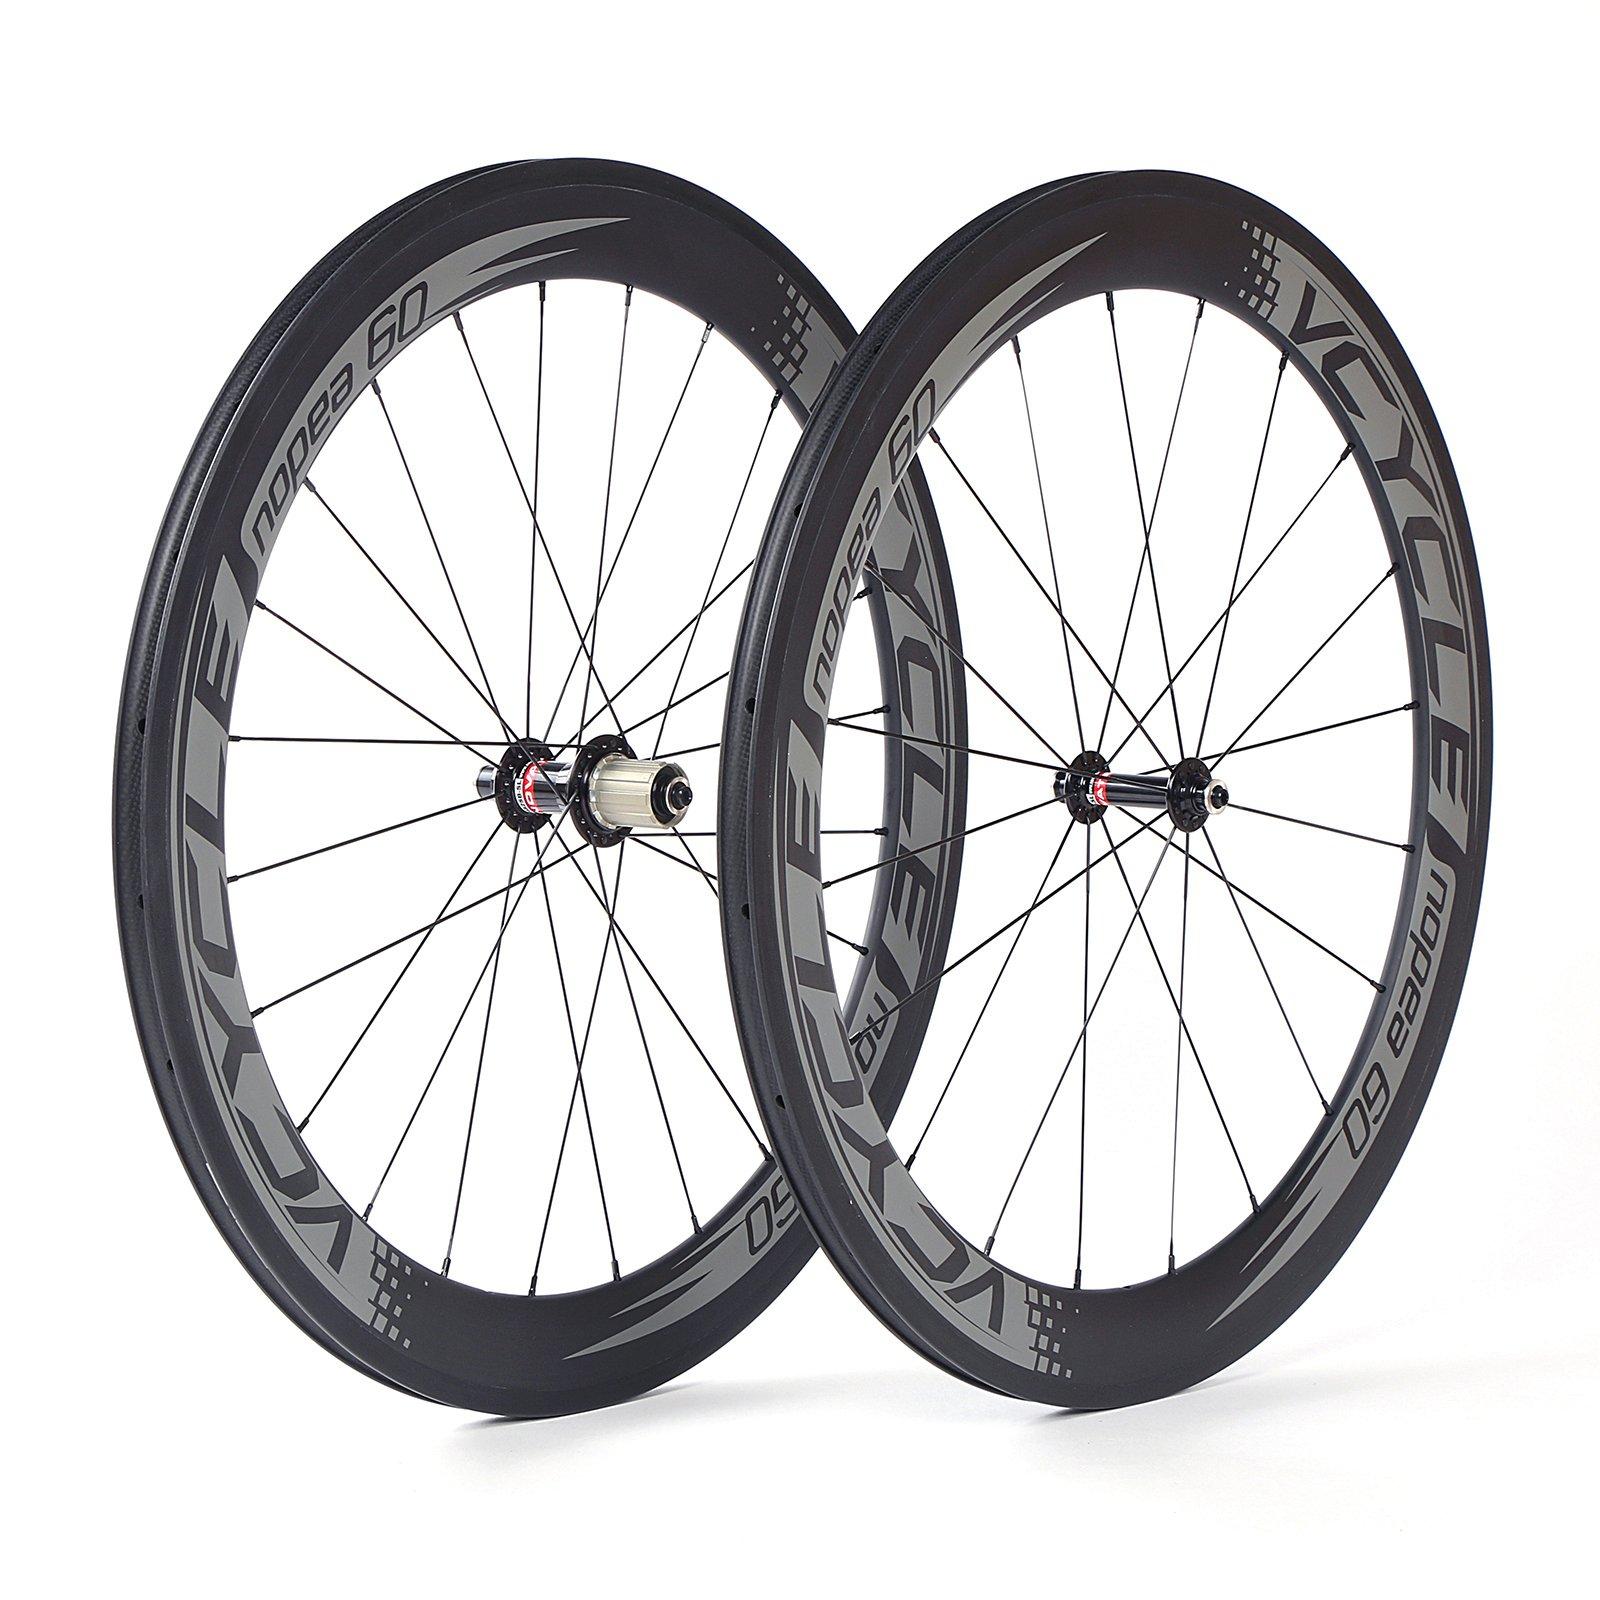 VCYCLE Nopea 700C Carbono Carretera Bicicleta Rueda Remachador 60mm S?o 1595g Para Shimano o